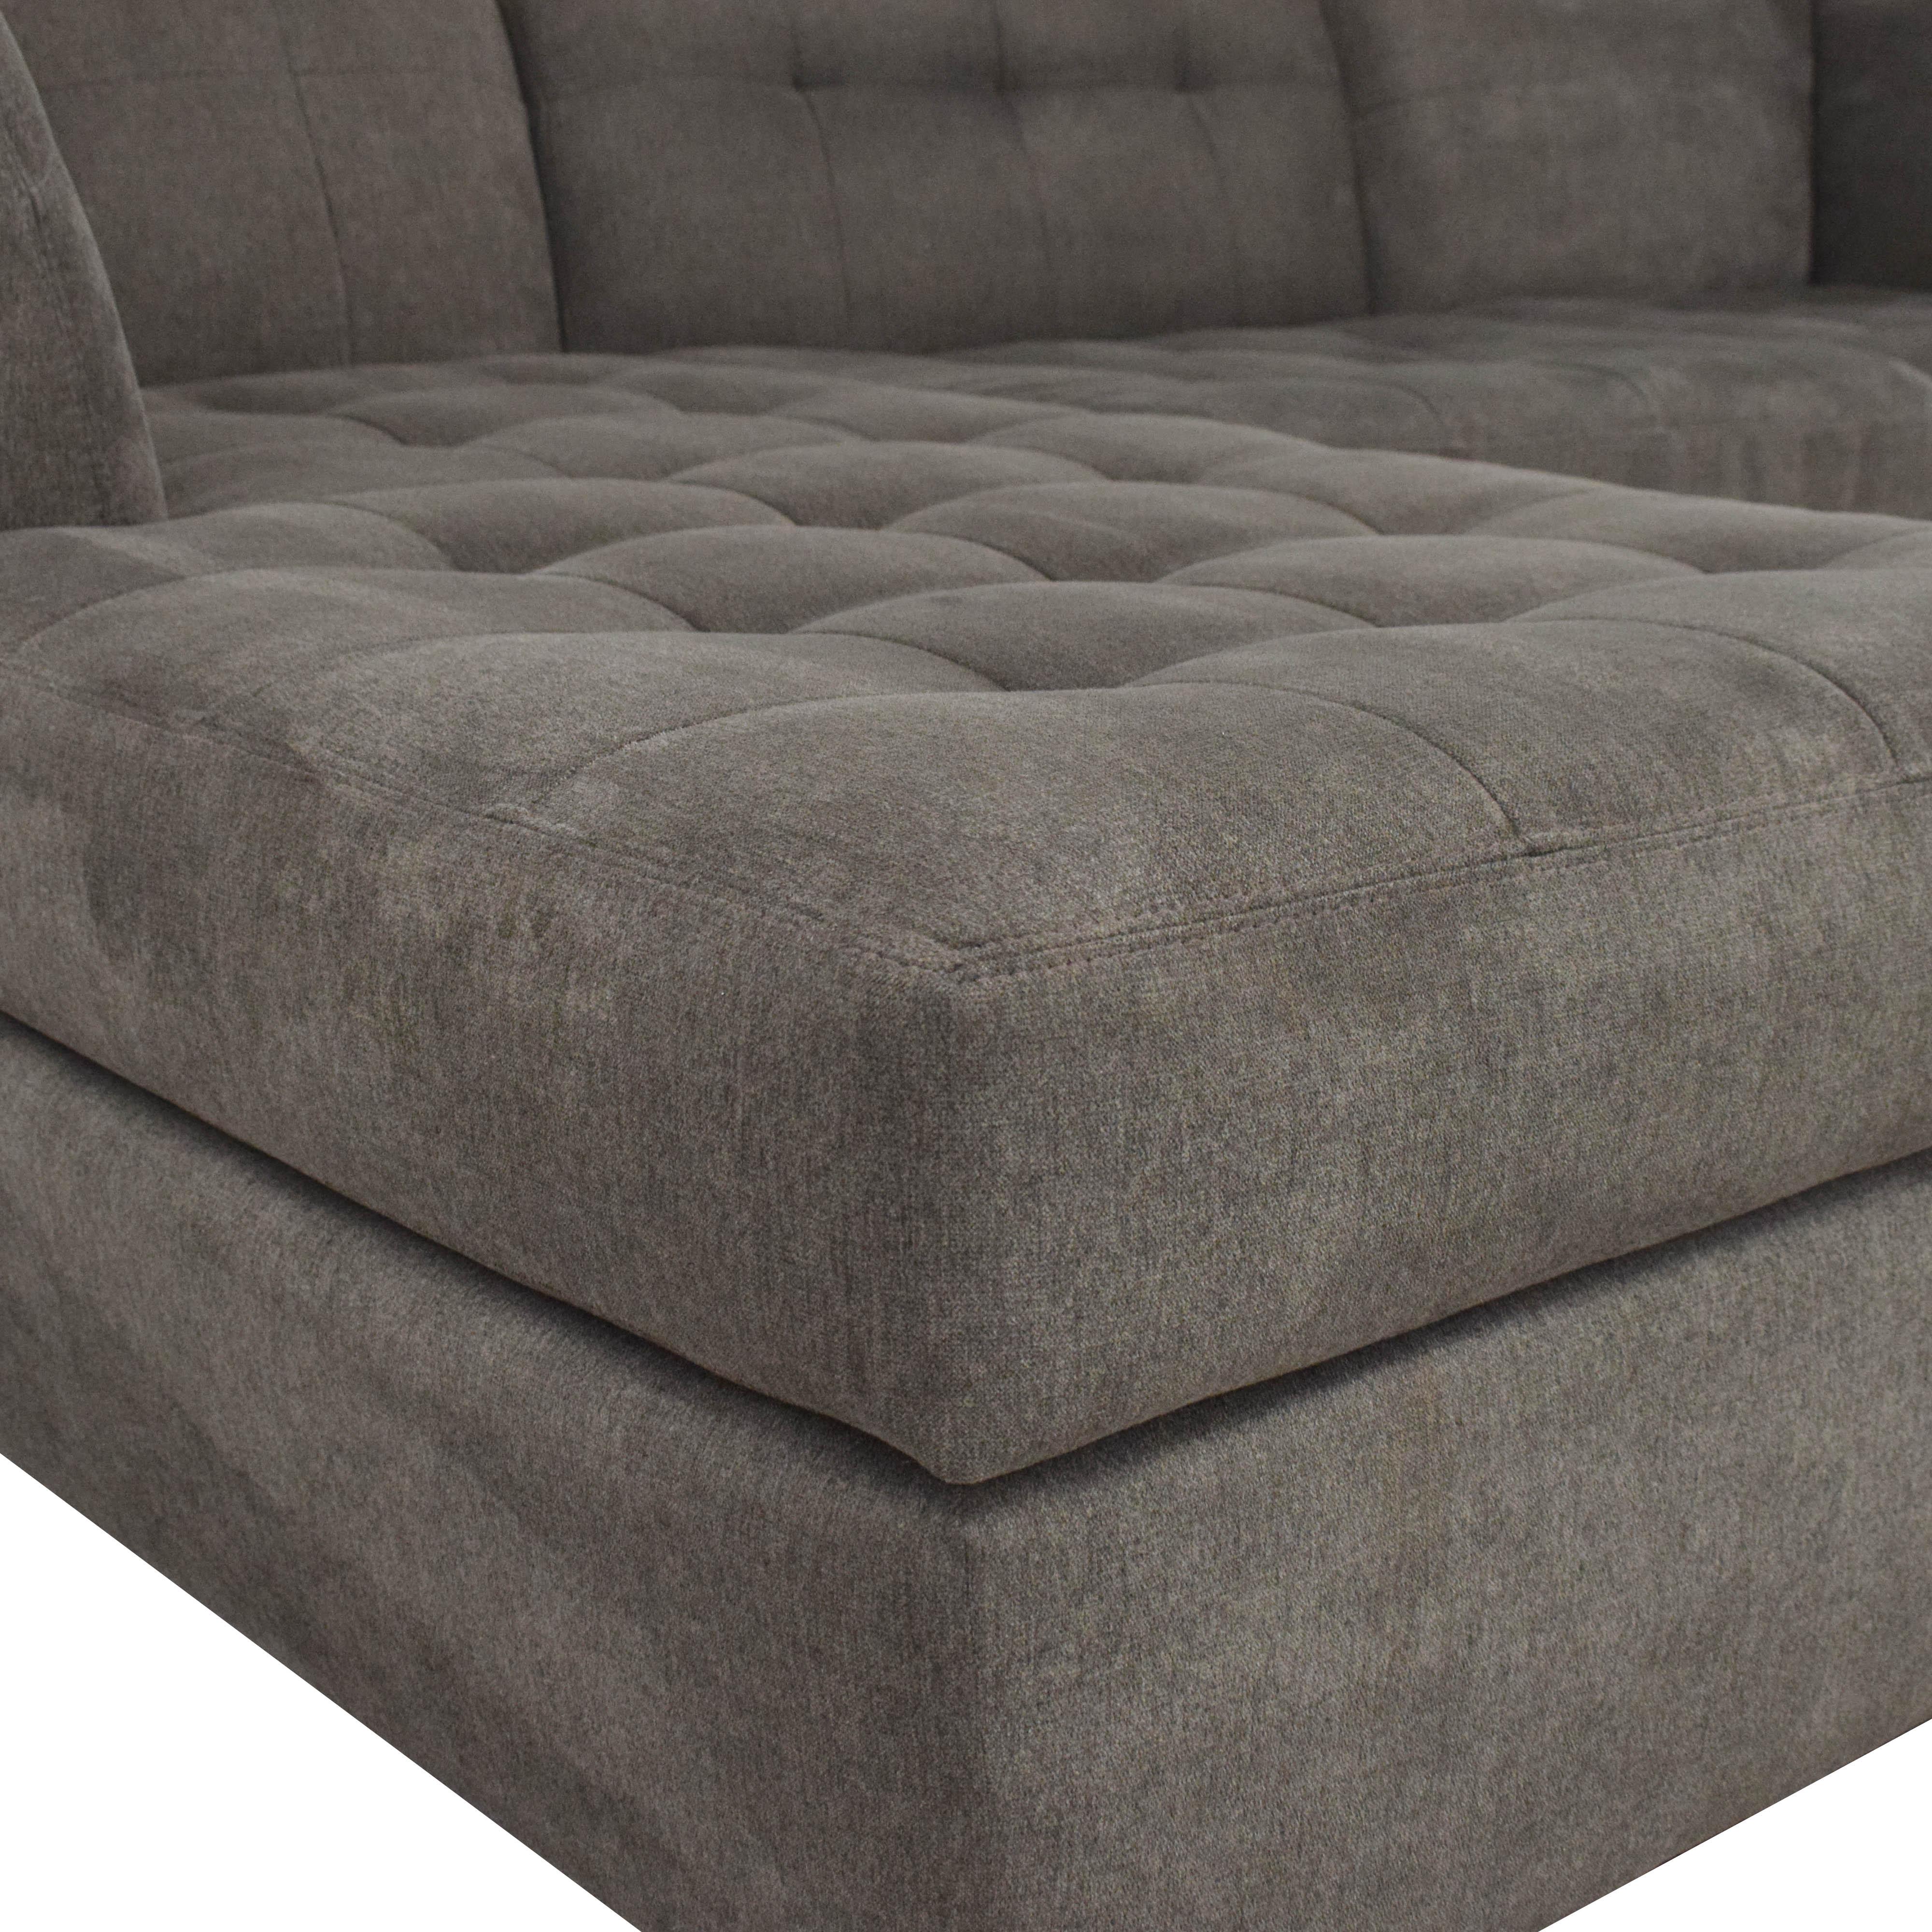 Jonathan Louis Jonathan Louis Roxanne II Chaise Sectional Sofa dimensions